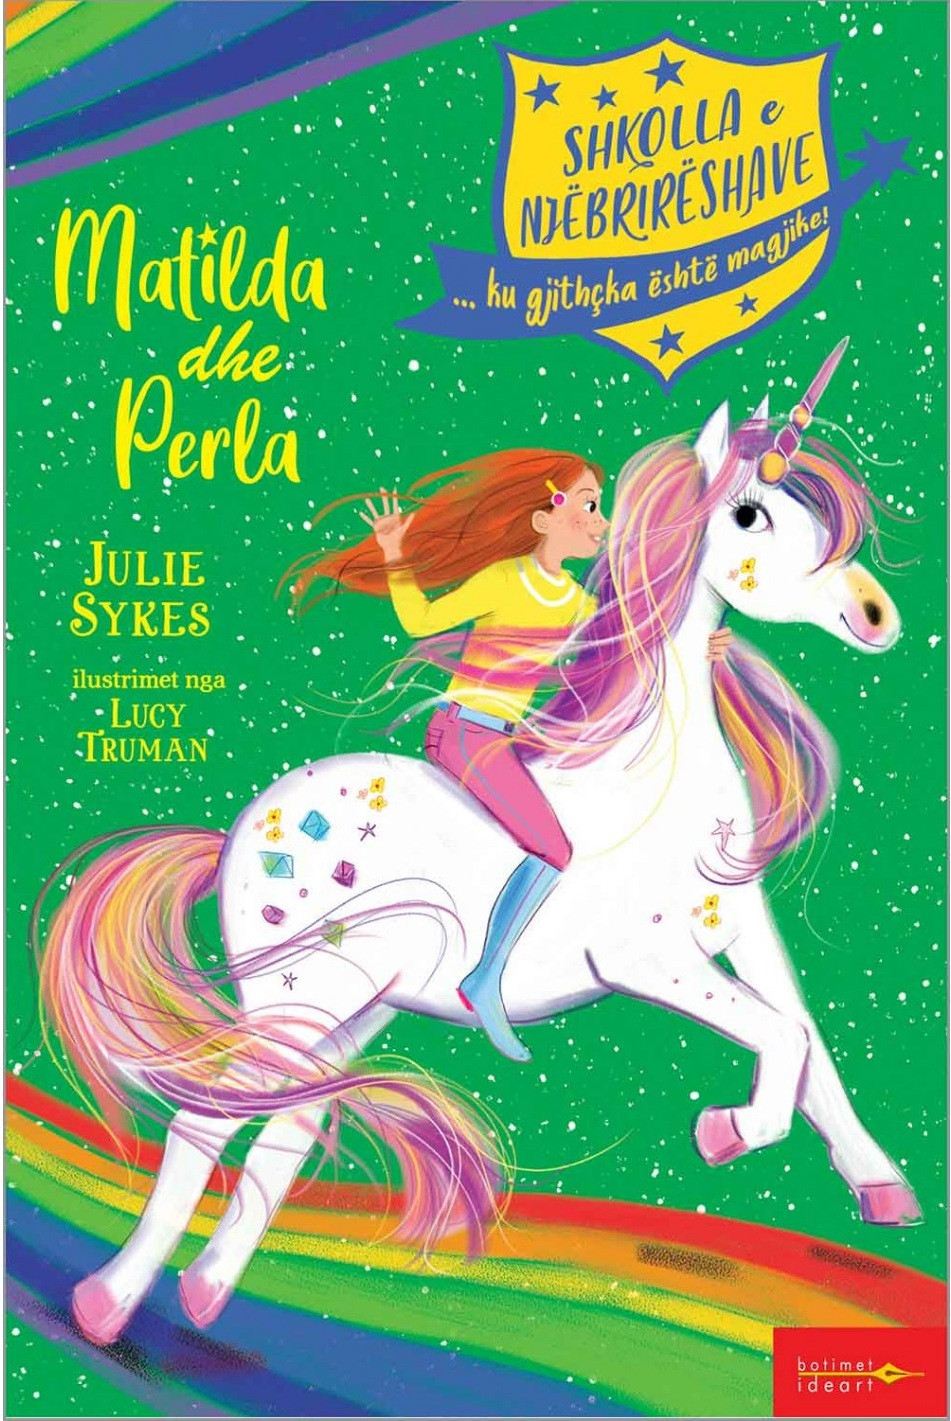 Shkolla enjebrireshave - Matilda dhe perla